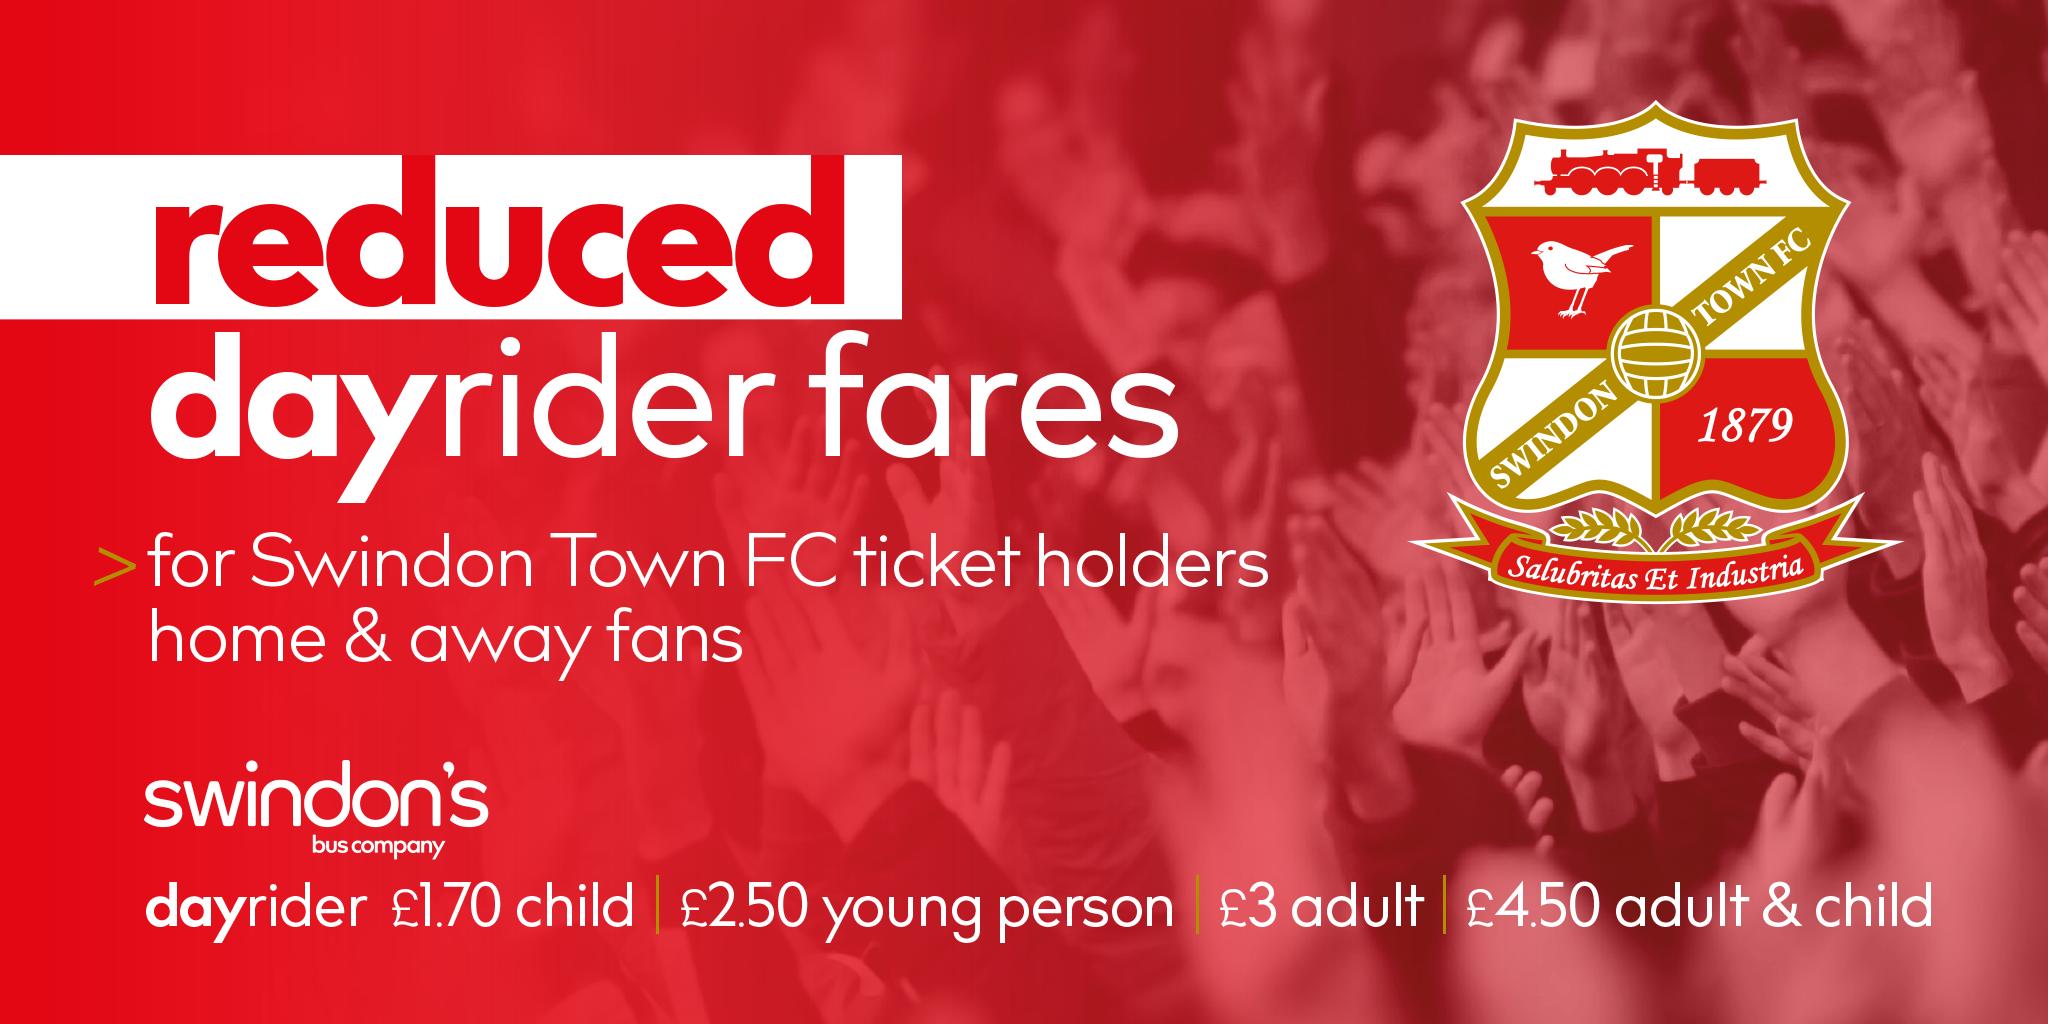 Swindon's Bus Company matchday dayrider deal